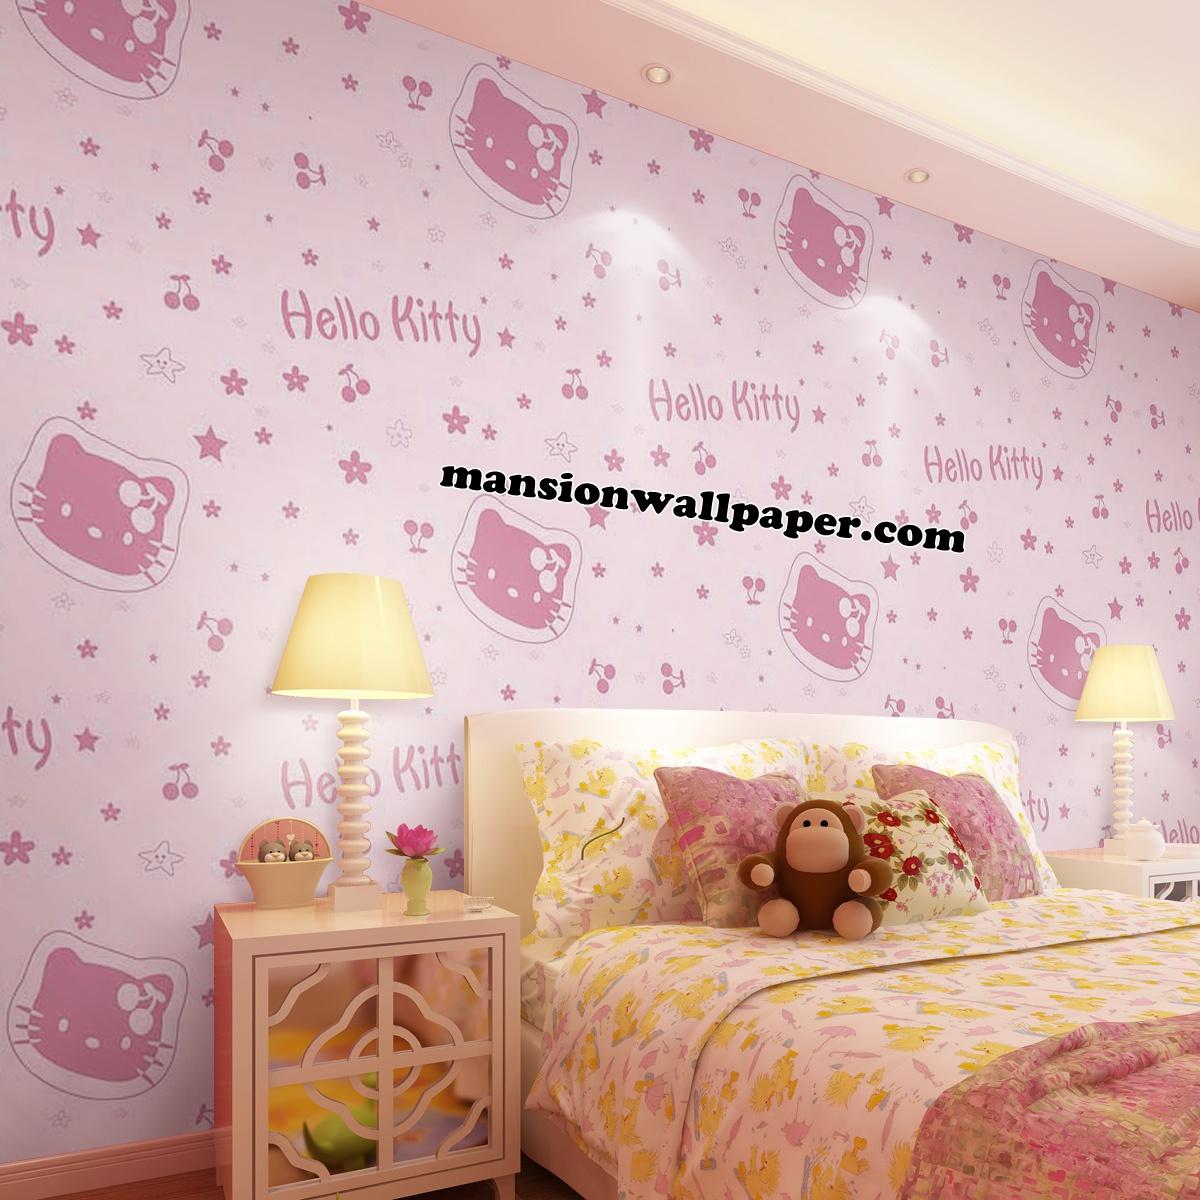 mansion wallpaper tokopedia